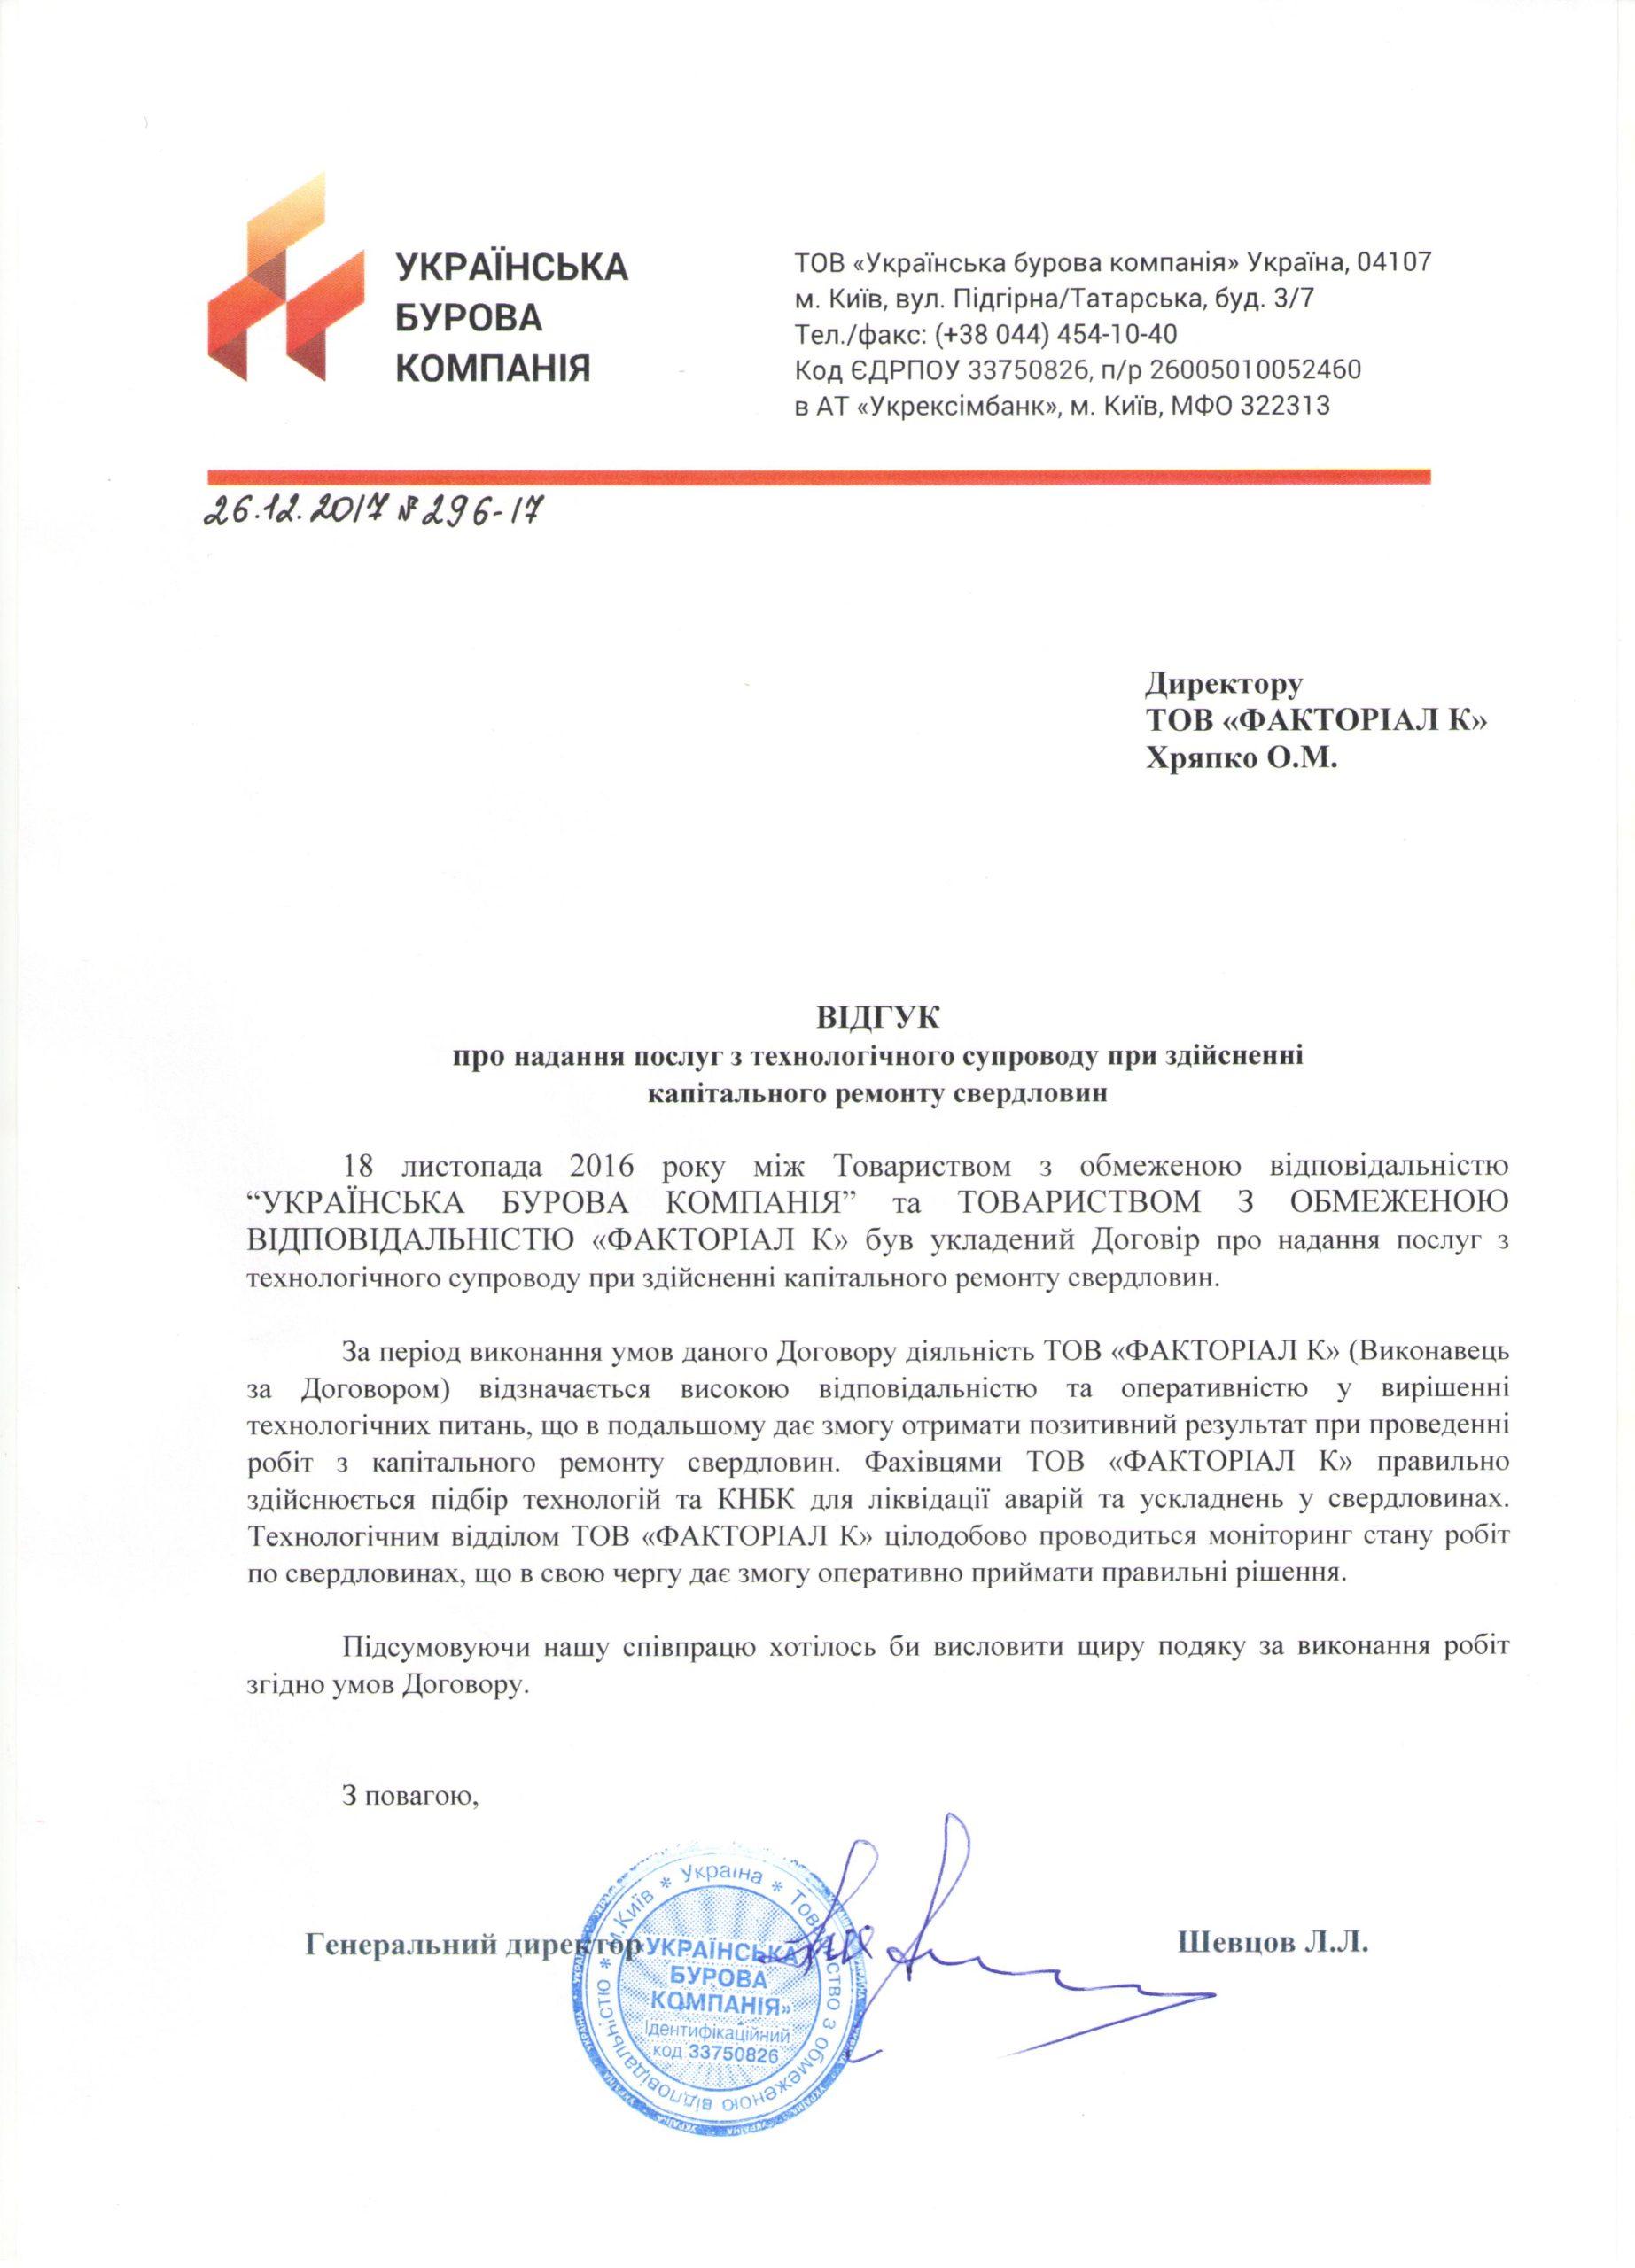 UDC_response